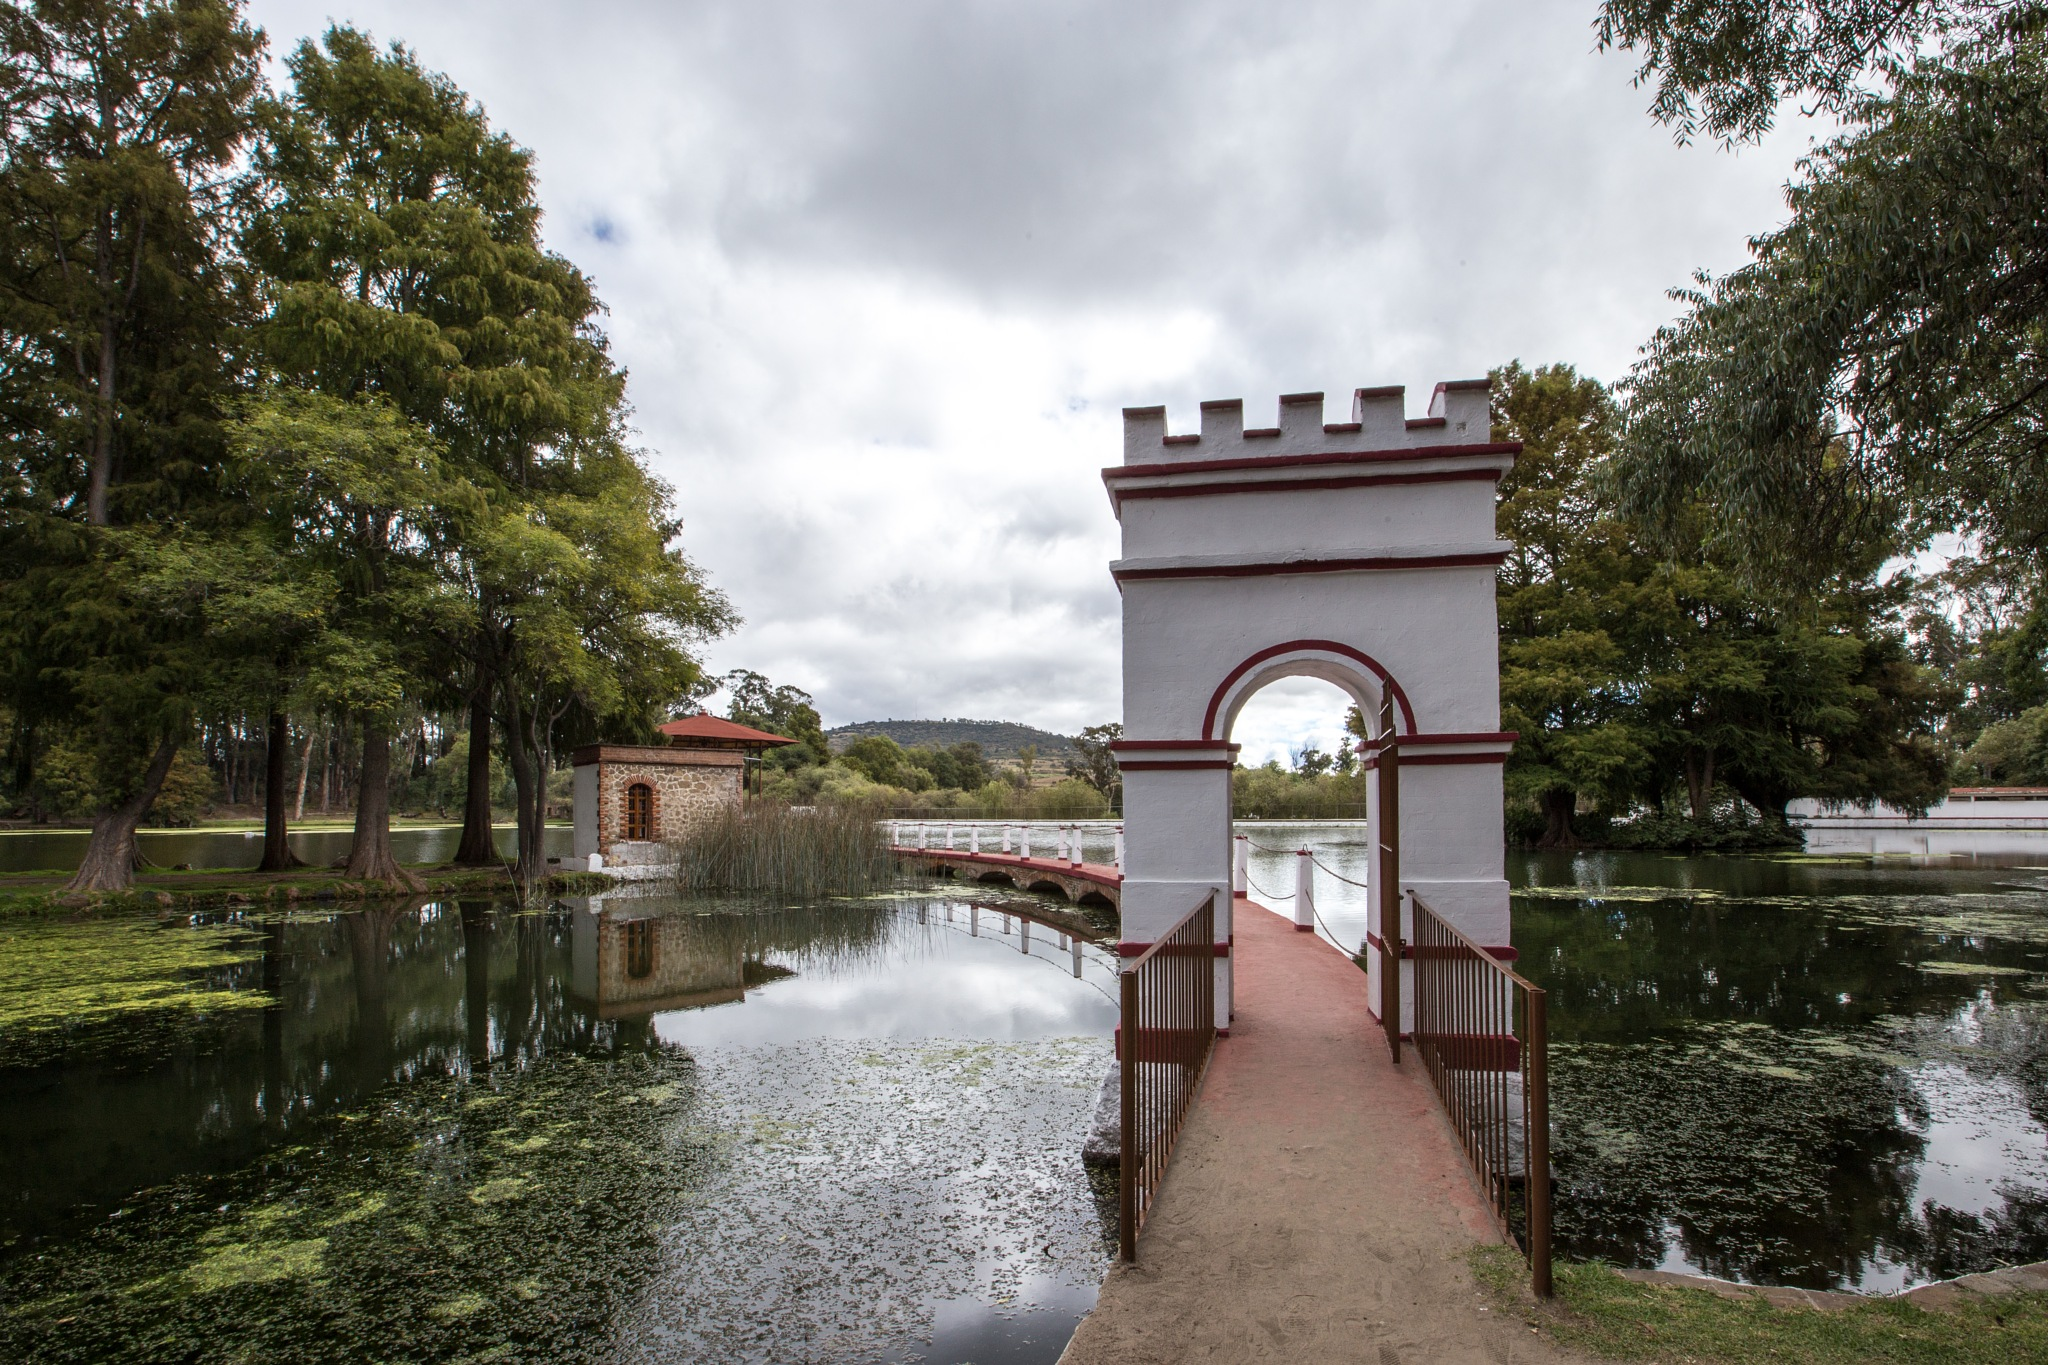 Ex hacienda de Chautla puente by rafael.ornelaseibanez